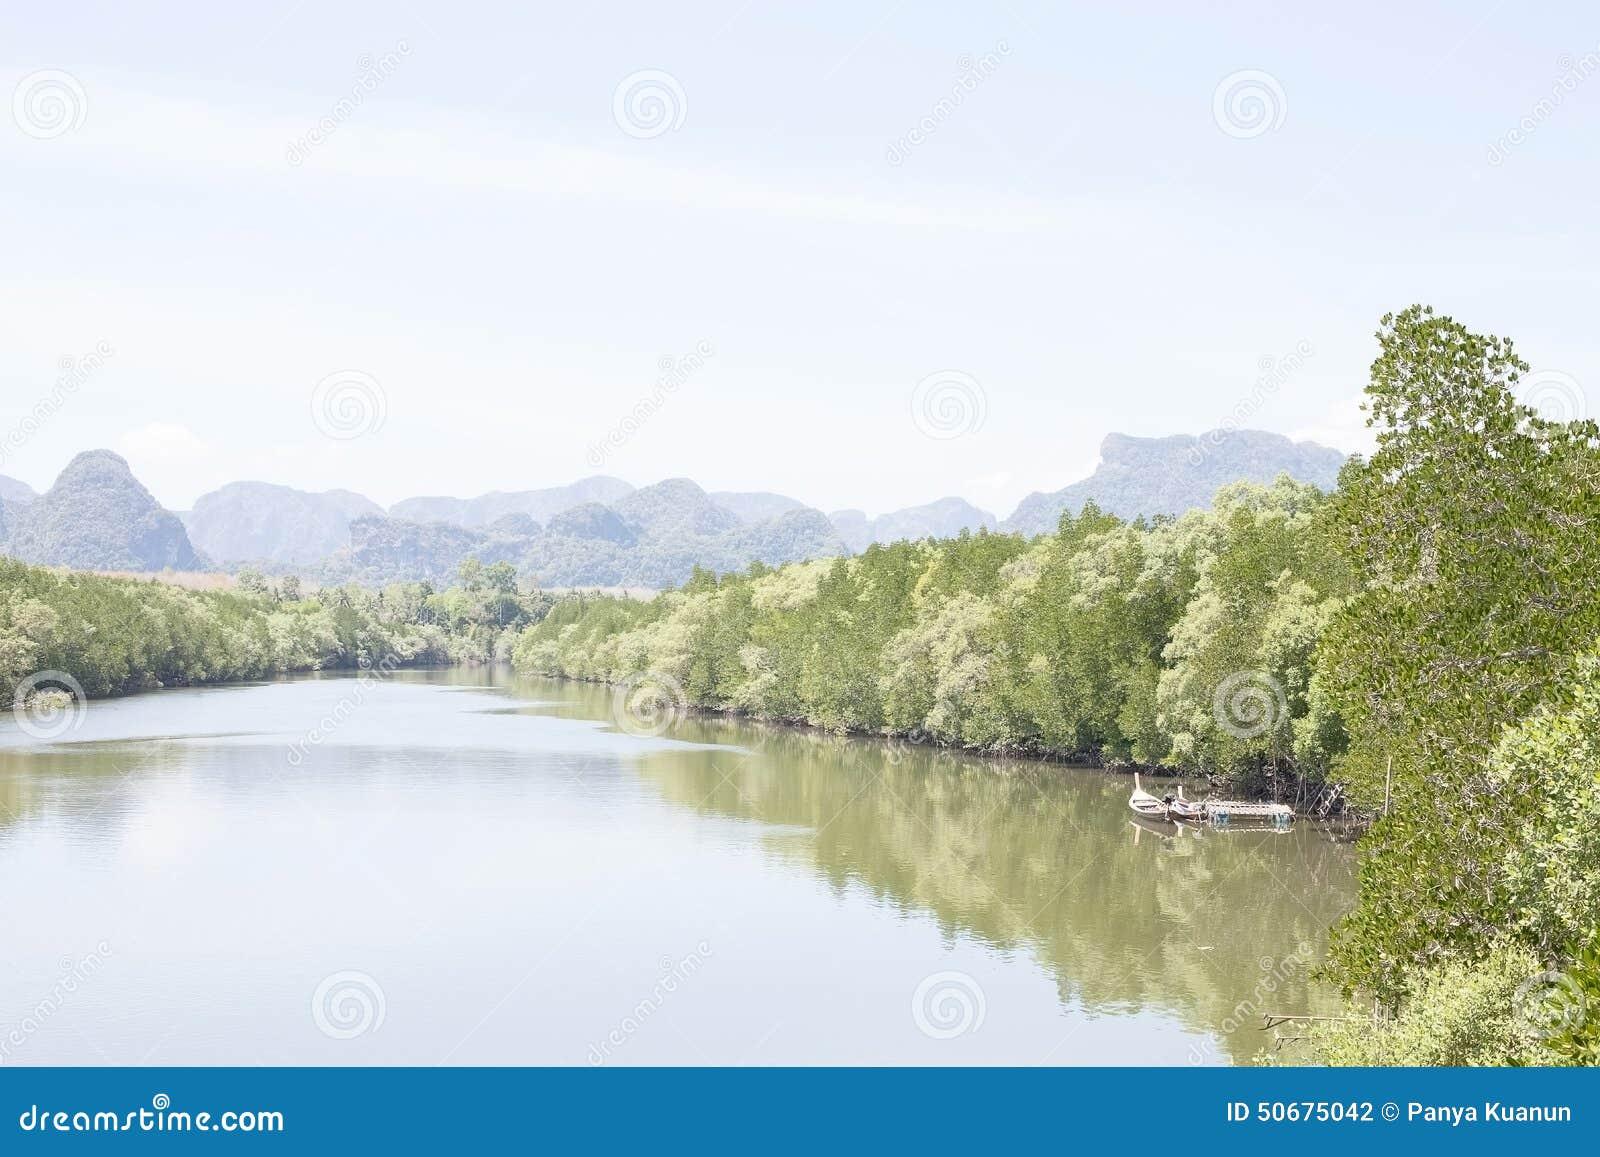 Download 在美洲红树运河停泊的Longtail小船 库存照片. 图片 包括有 美洲红树, 海运, 气候, 停泊, 浮动 - 50675042